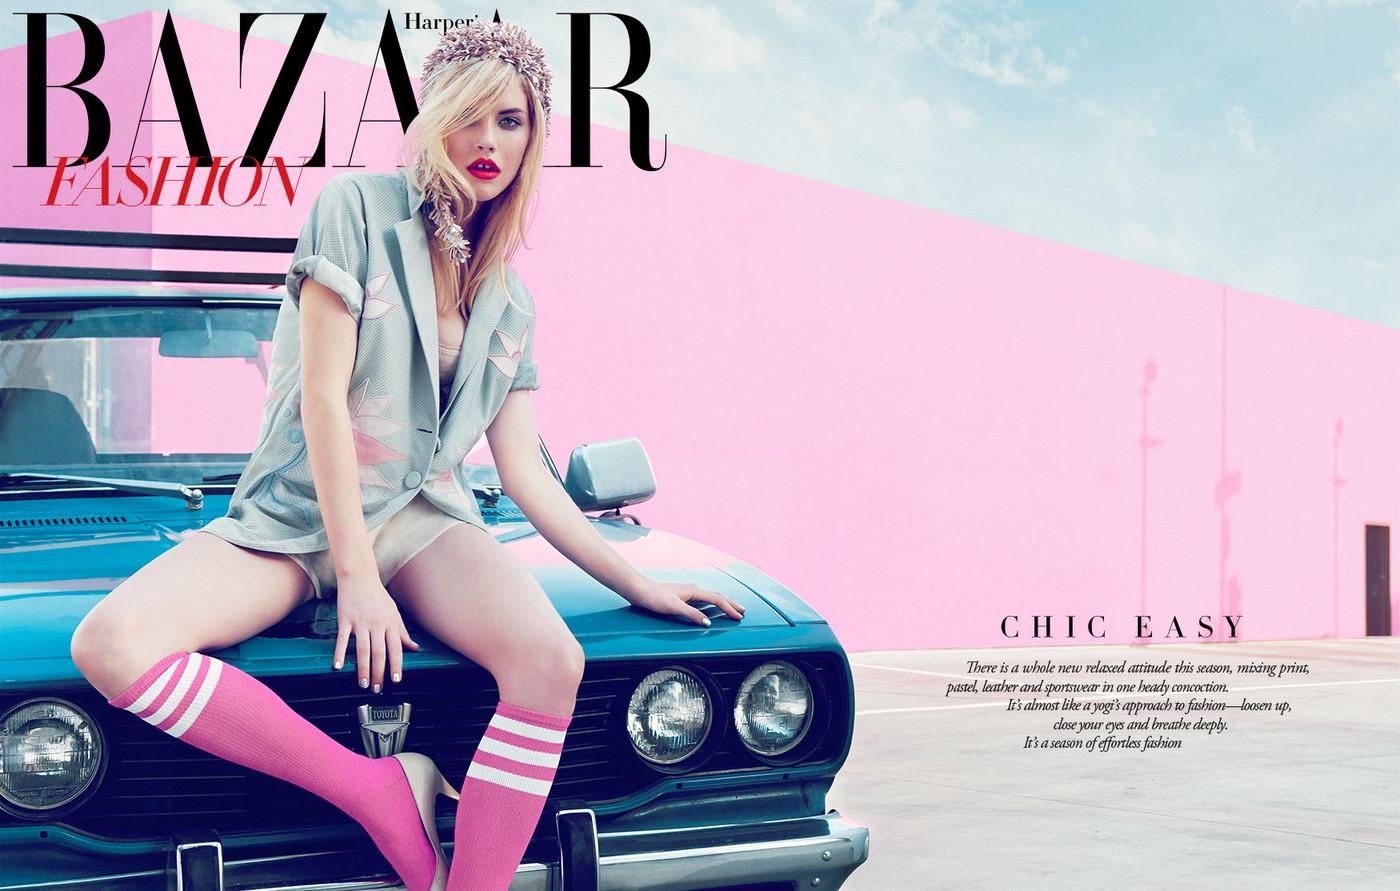 Ashley Smith for Harper's Bazaar